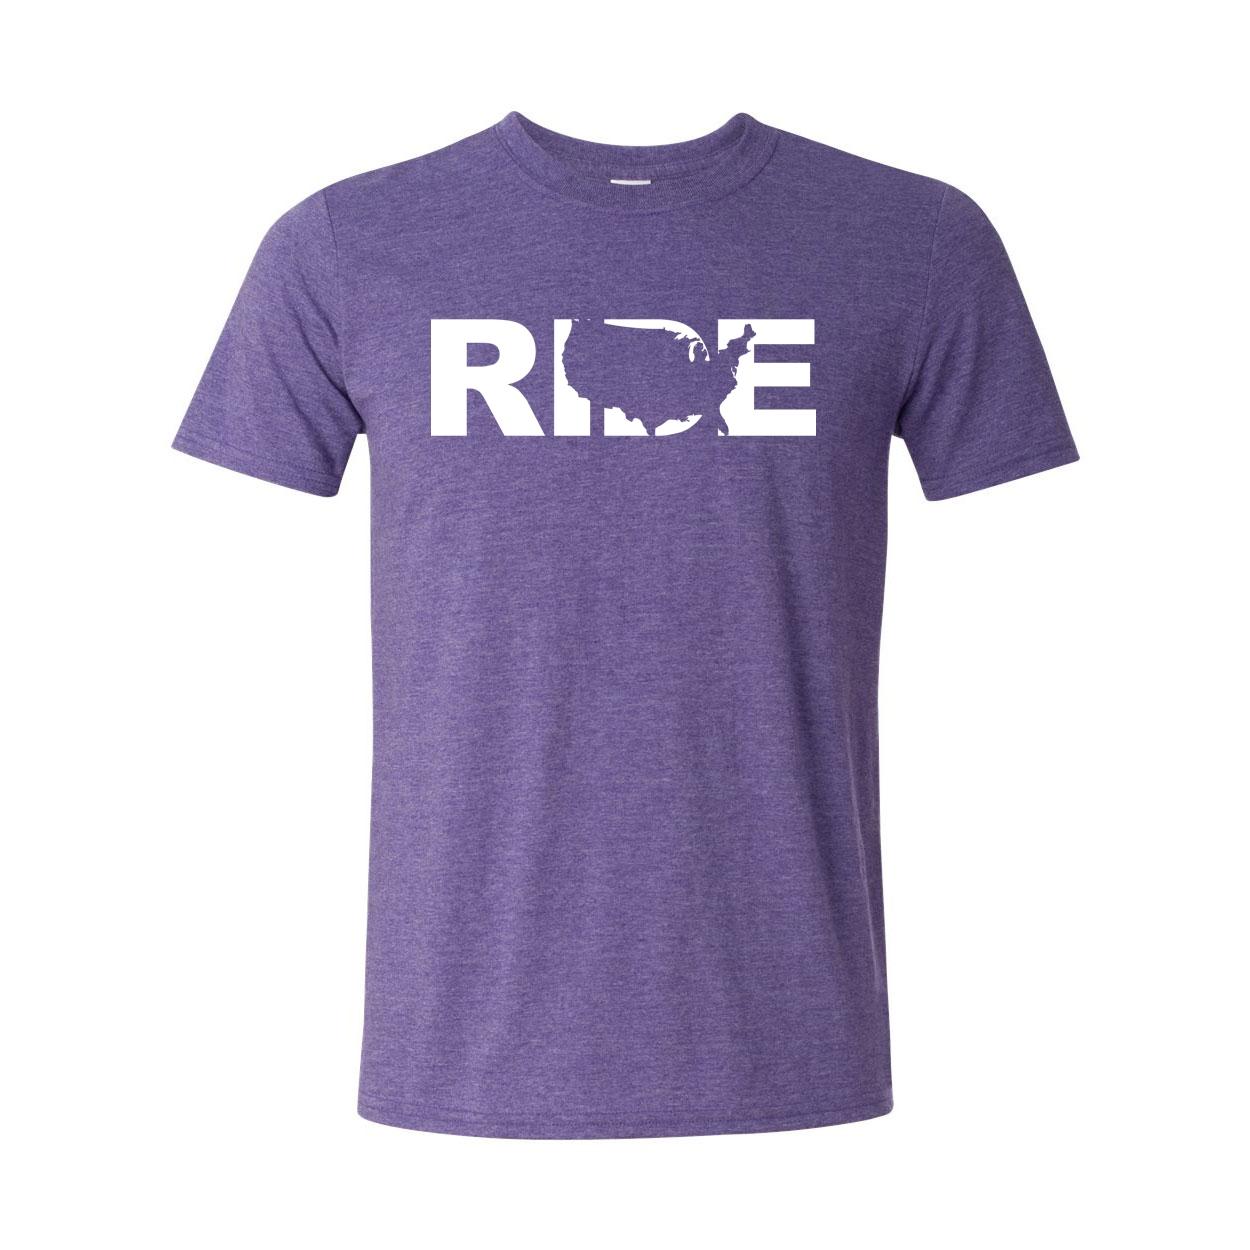 Ride United States Classic T-Shirt Heather Purple (White Logo)